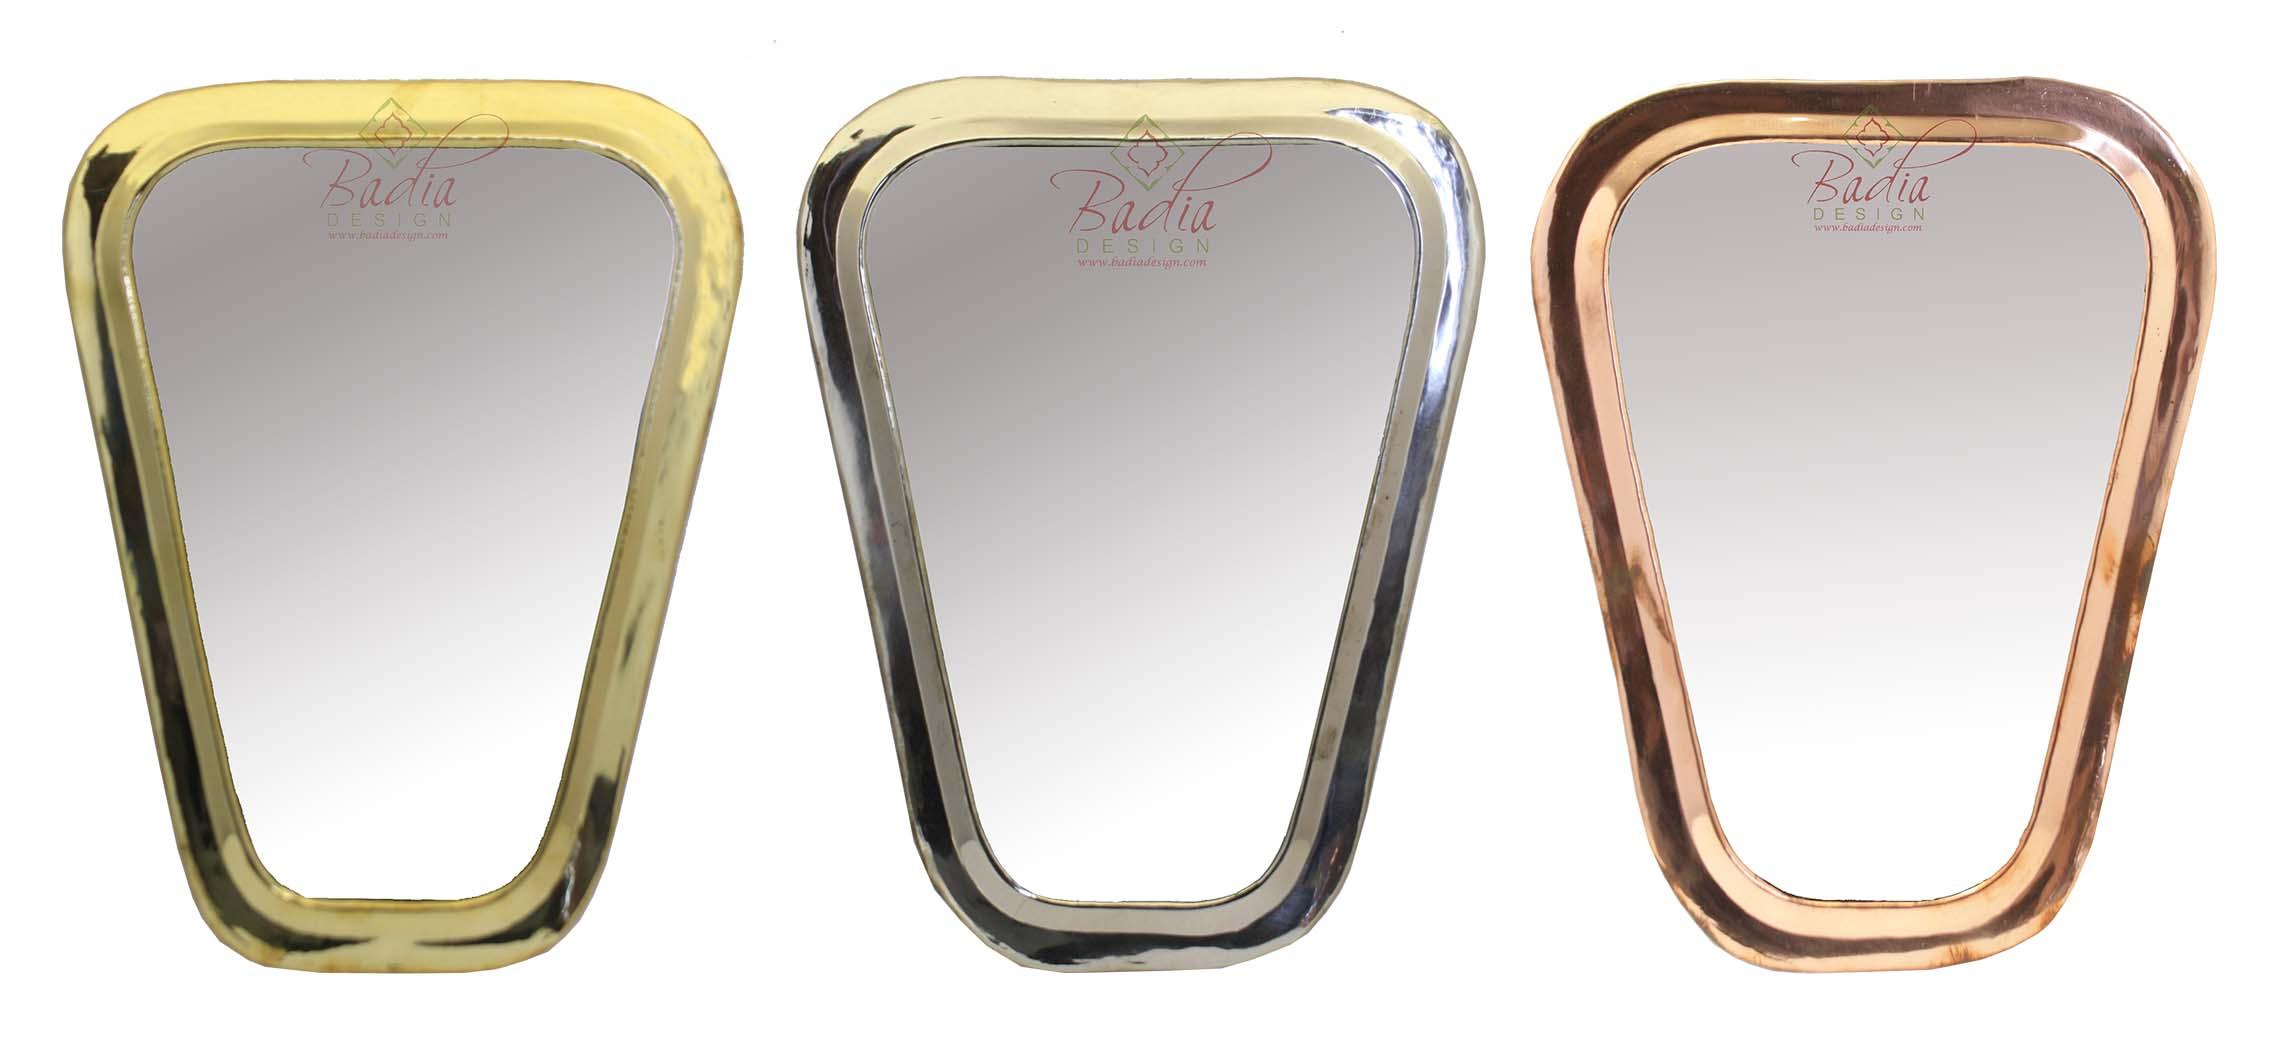 moroccan-decorative-metal-mirrors-m-em014.jpg